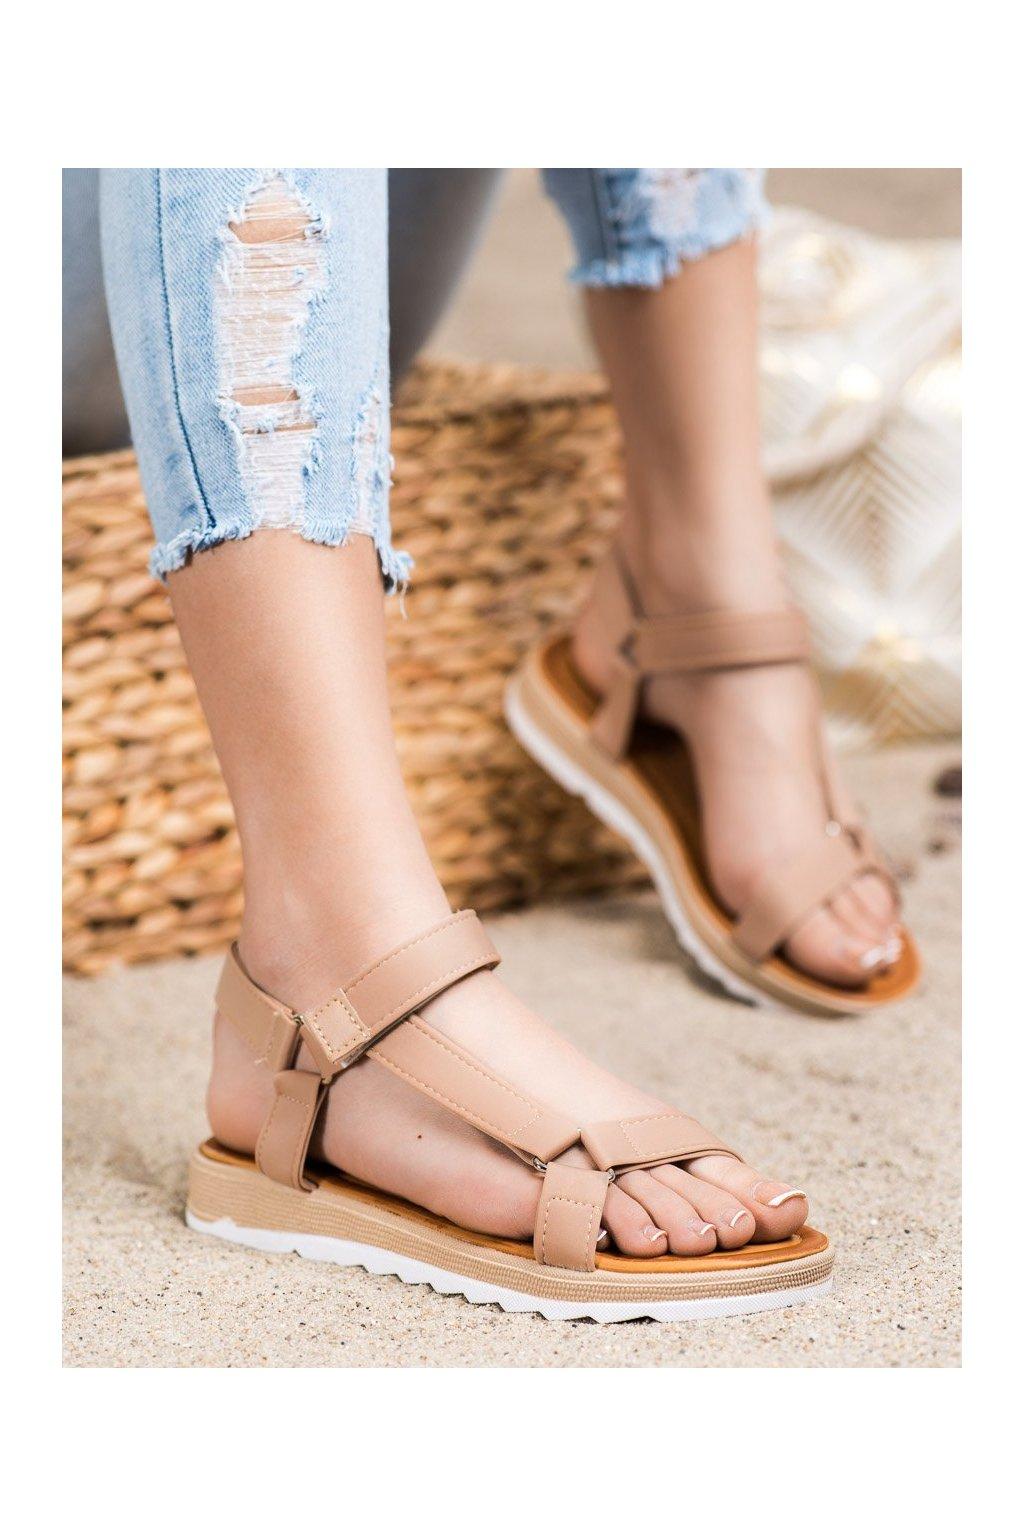 Hnedé sandále Shelovet kod WS9027KH